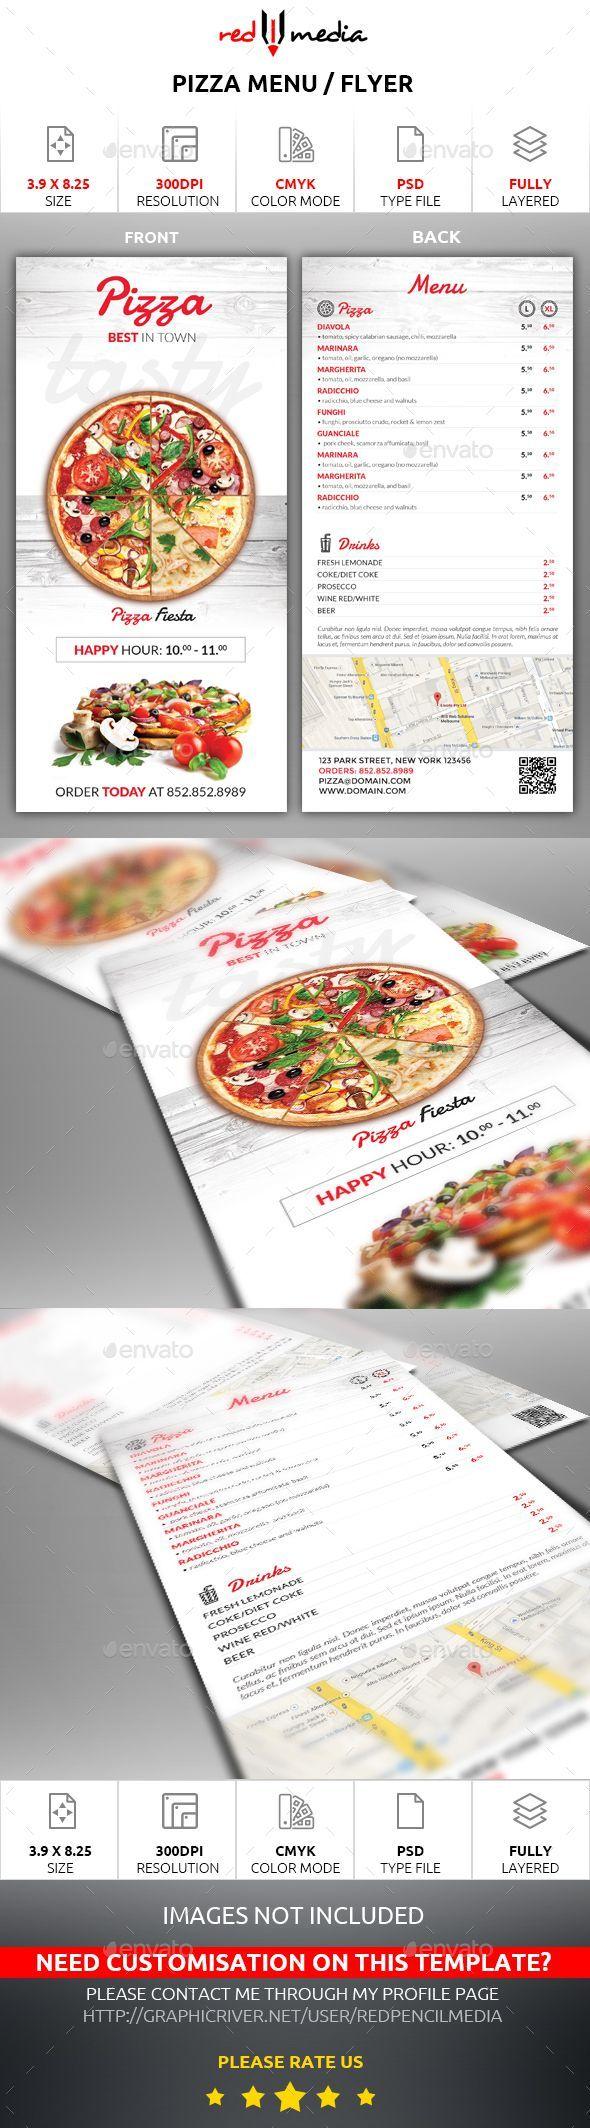 #Pizza Menu / Flyer - #Restaurant #Flyers Download here: https://graphicriver.net/item/pizza-menu-flyer/15367076?ref=alena994